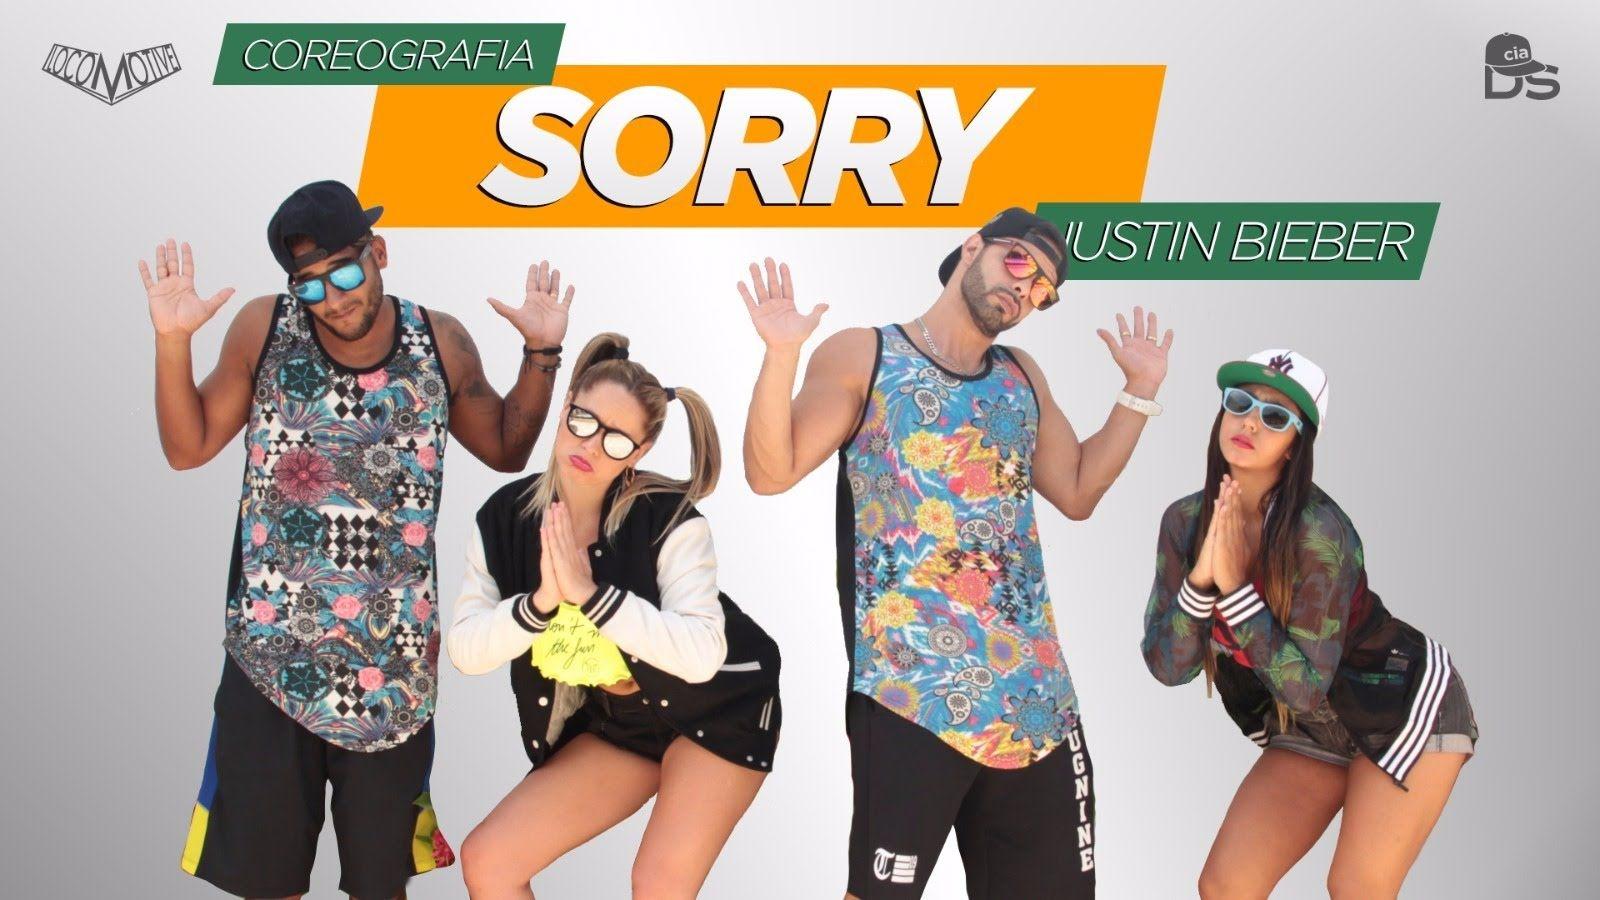 Sorry - Justin Bieber Cia. Daniel Saboya (Coreografia)